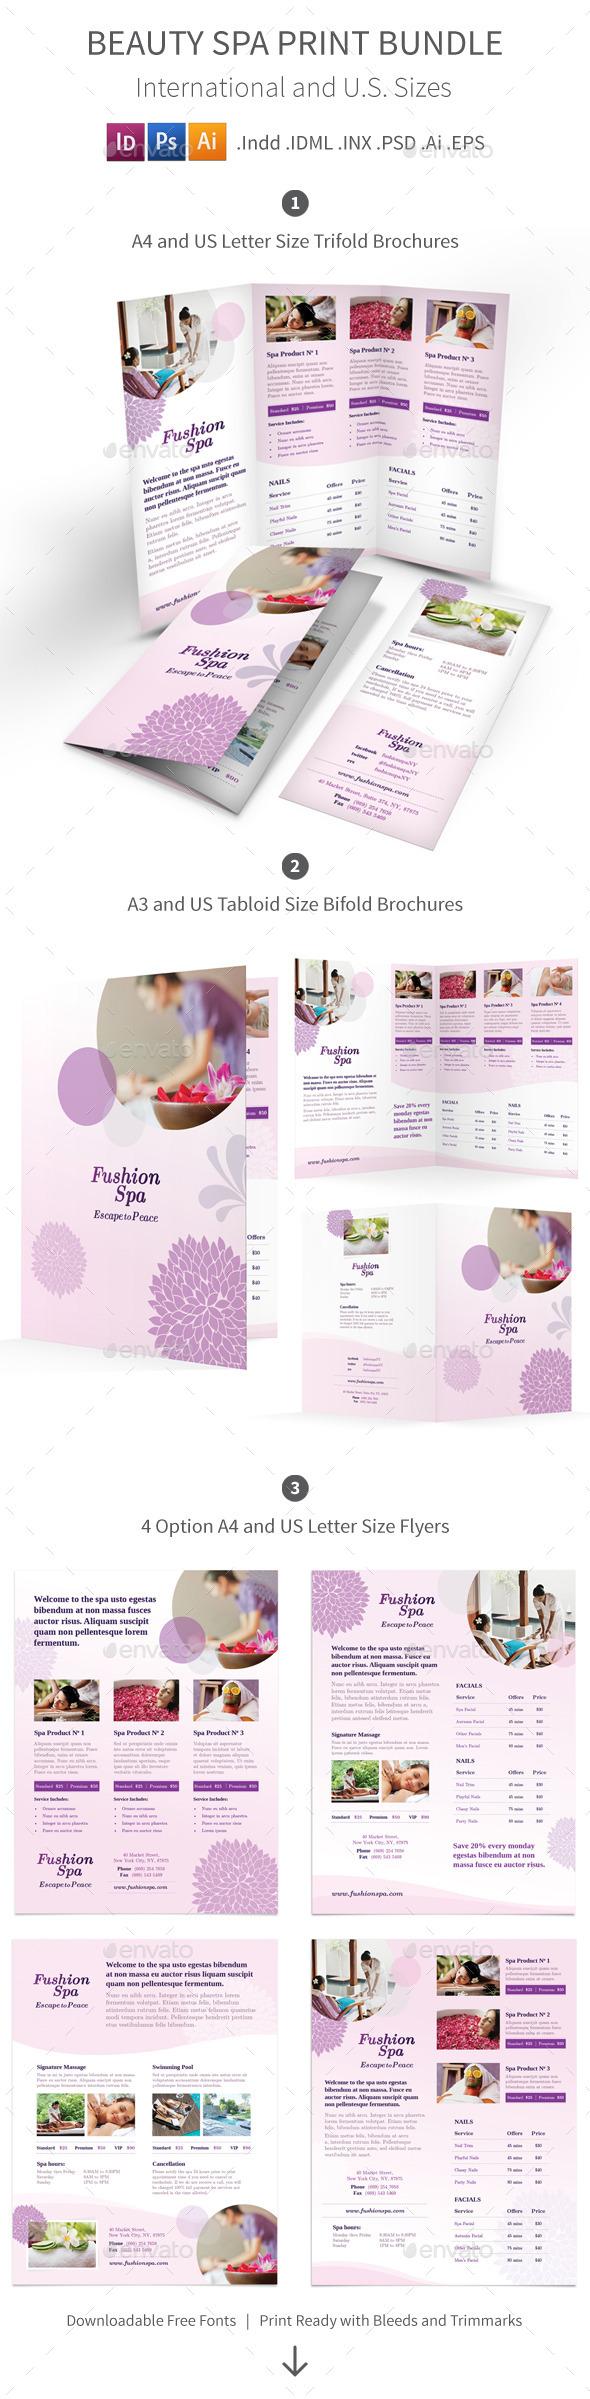 Beauty Spa Print Bundle - Informational Brochures